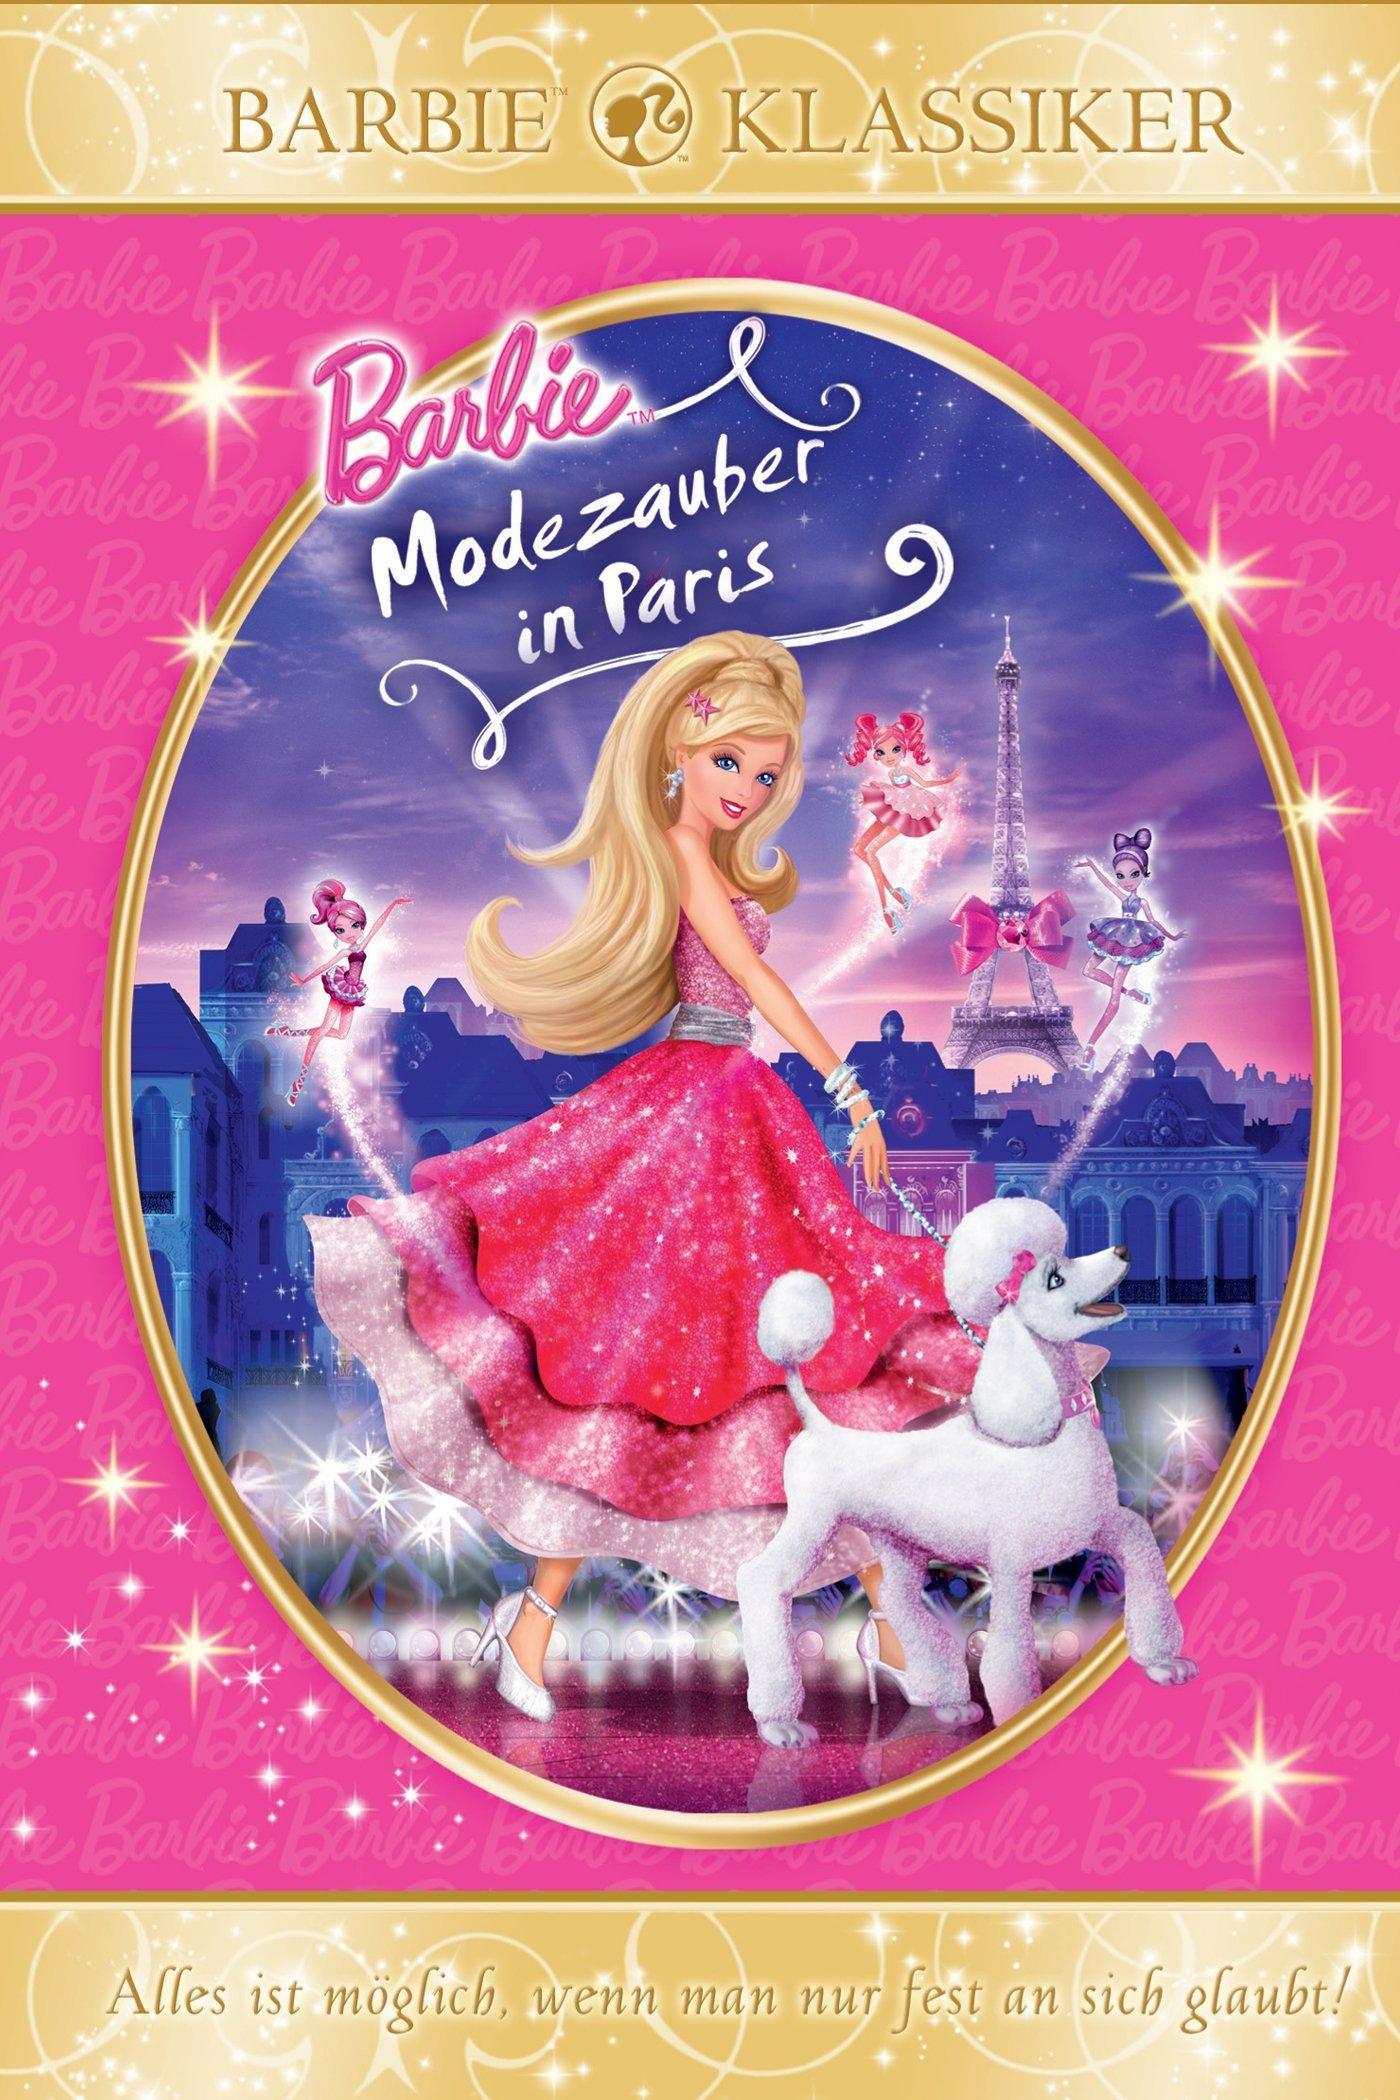 Barbie Deutsch Ganzer Film Modezauber In Paris Business Bags Men Black Side Bag Image House